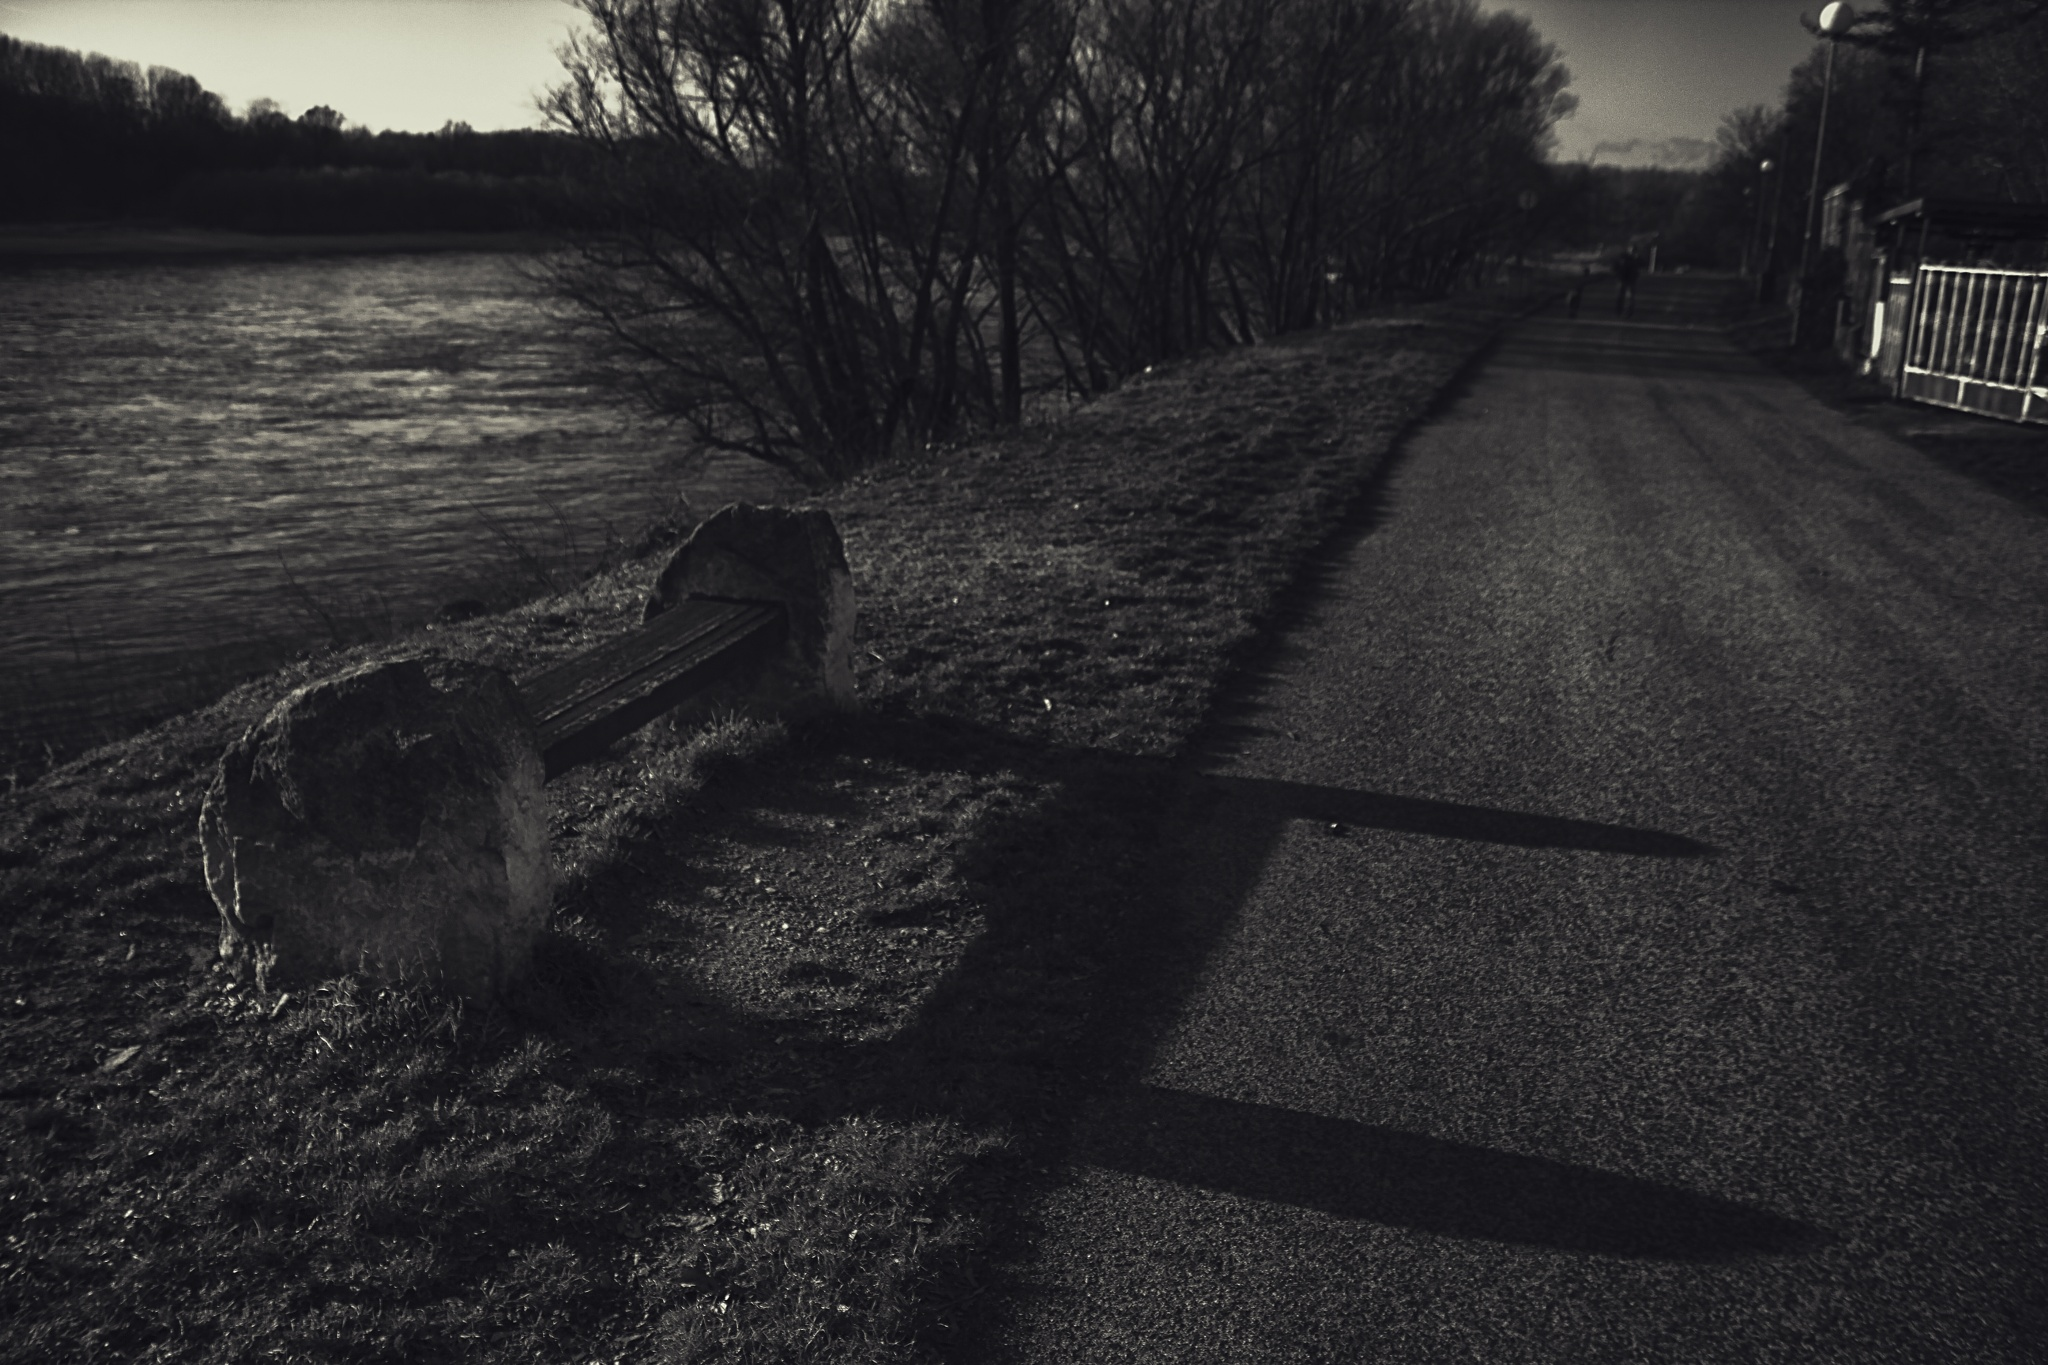 ~The dark Roadside~ by AdamscreationS